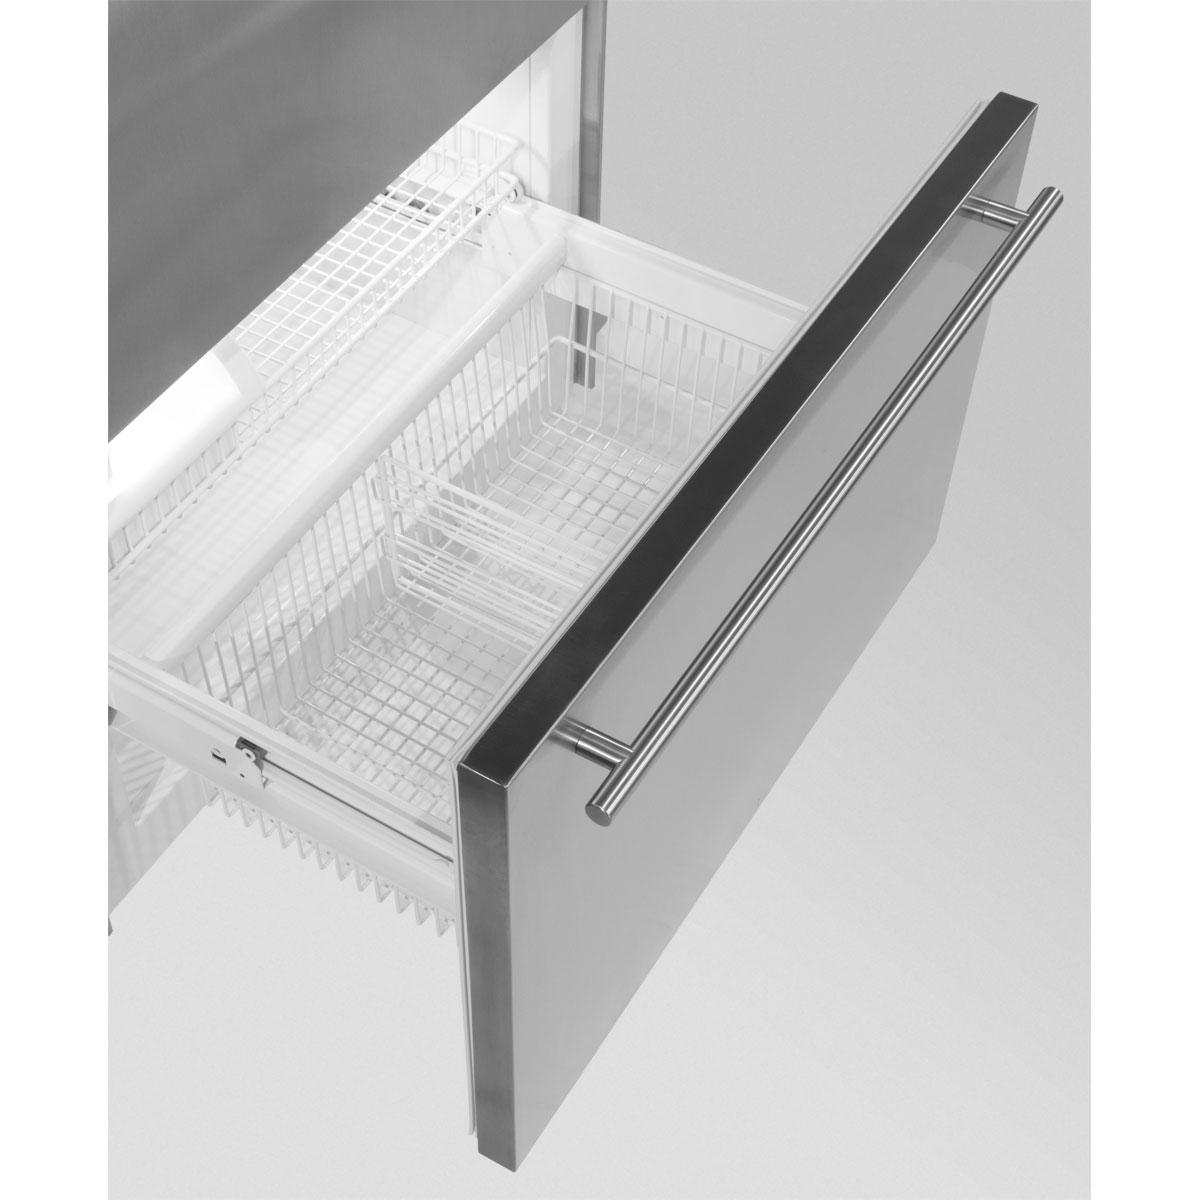 "Model: MP36BF2RS | Marvel  Marvel Professional Built-In 36"" Bottom Freezer Refrigerator- Solid Stainless Steel Door   Right Hinge, Slim Designer Handle"